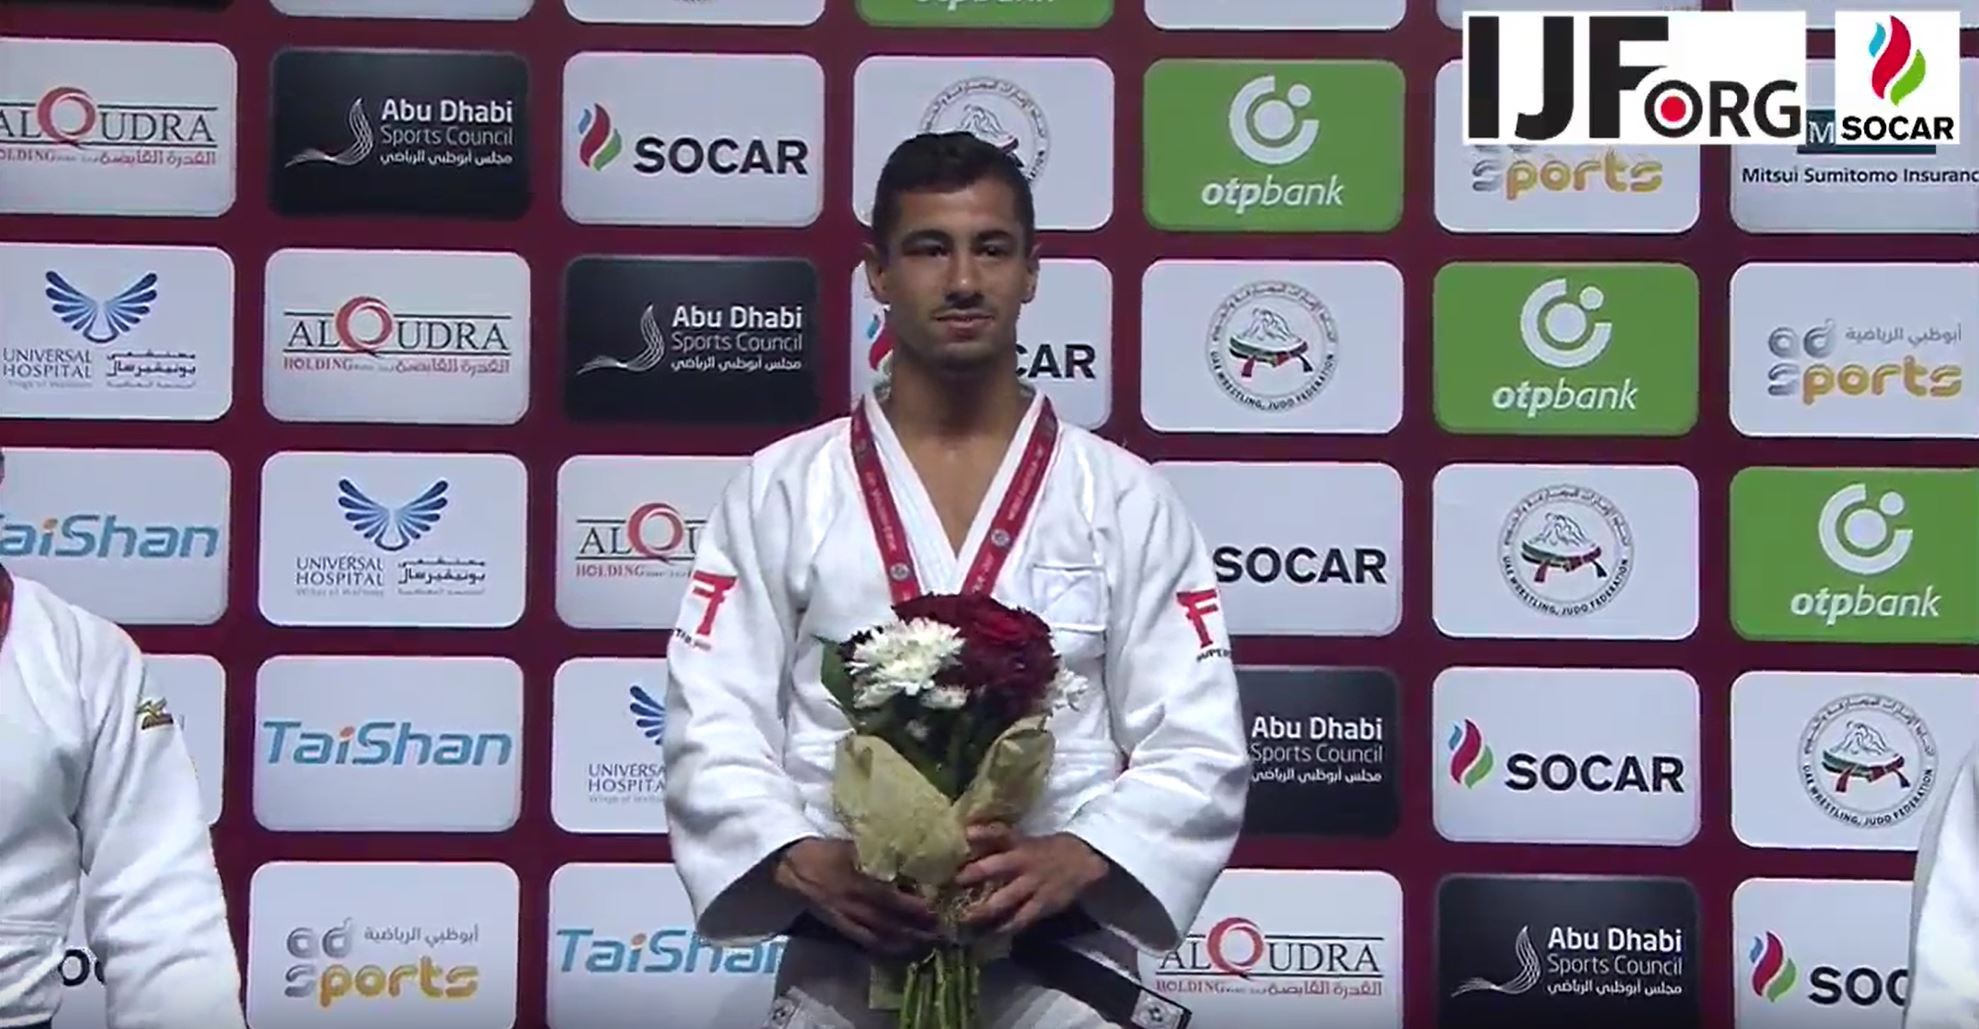 Israeli judoka wins gold in UAE but not under Israel flag